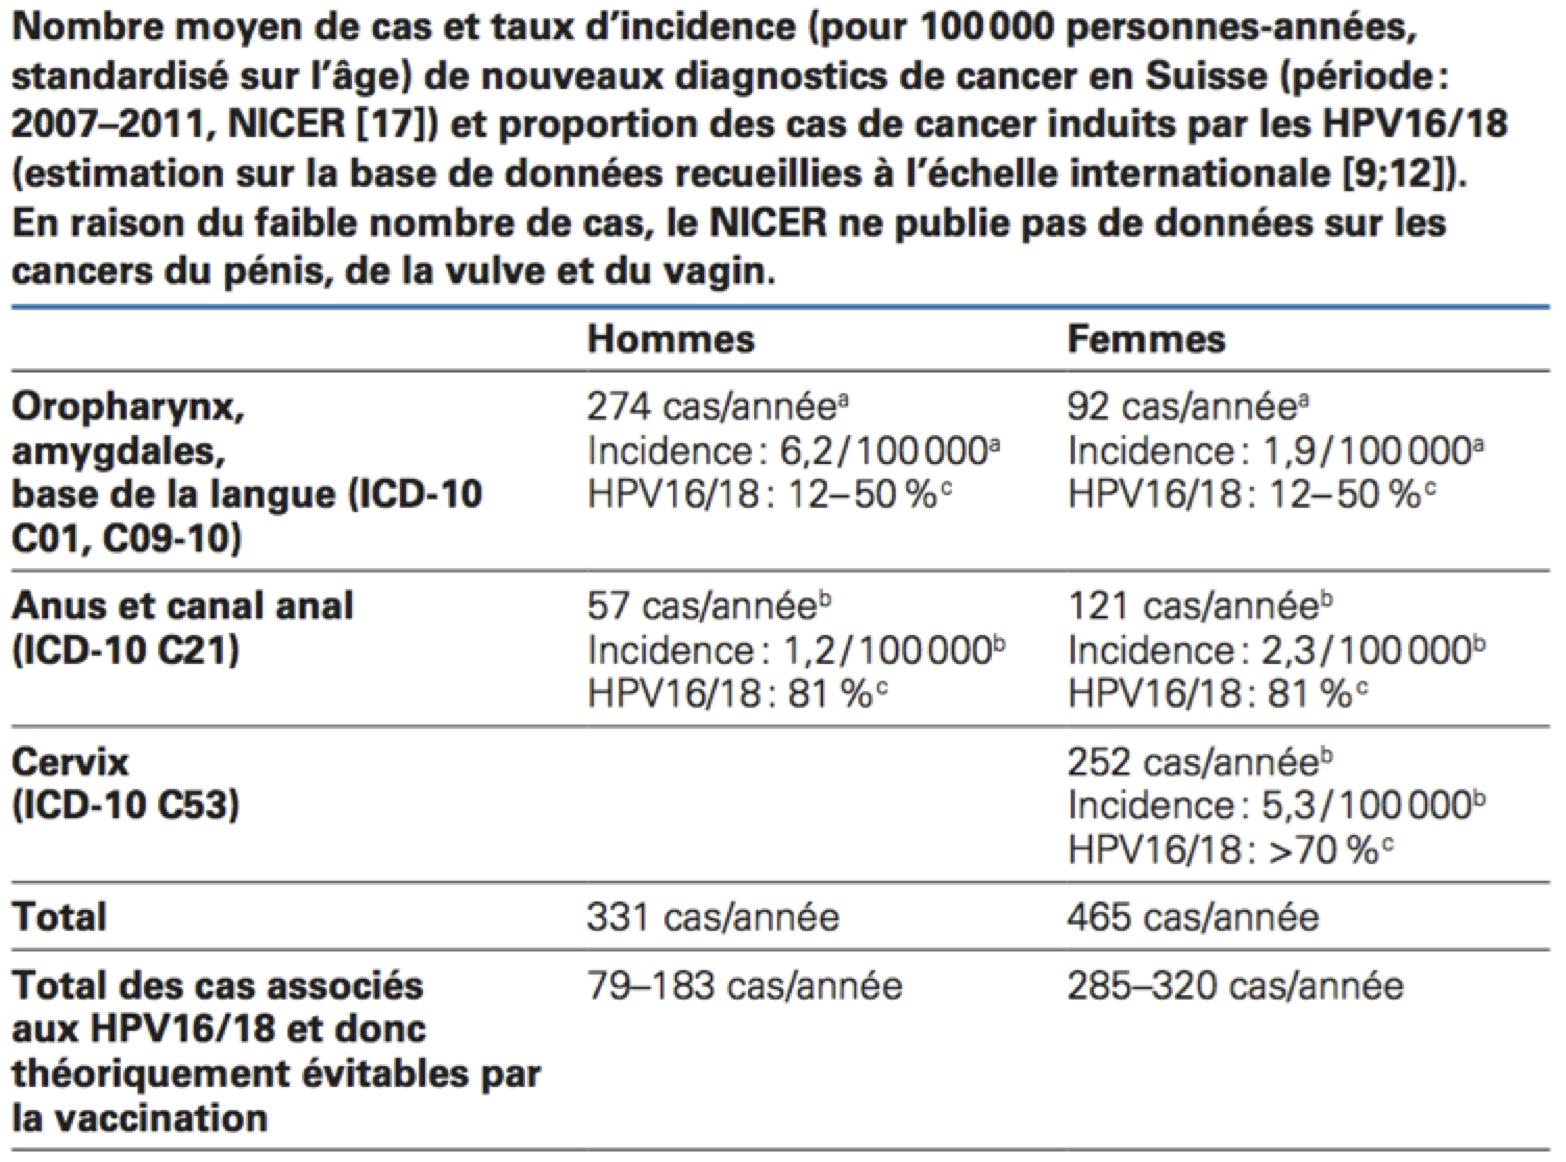 Vaccino papilloma virus eta massima - coboramlaprima.ro